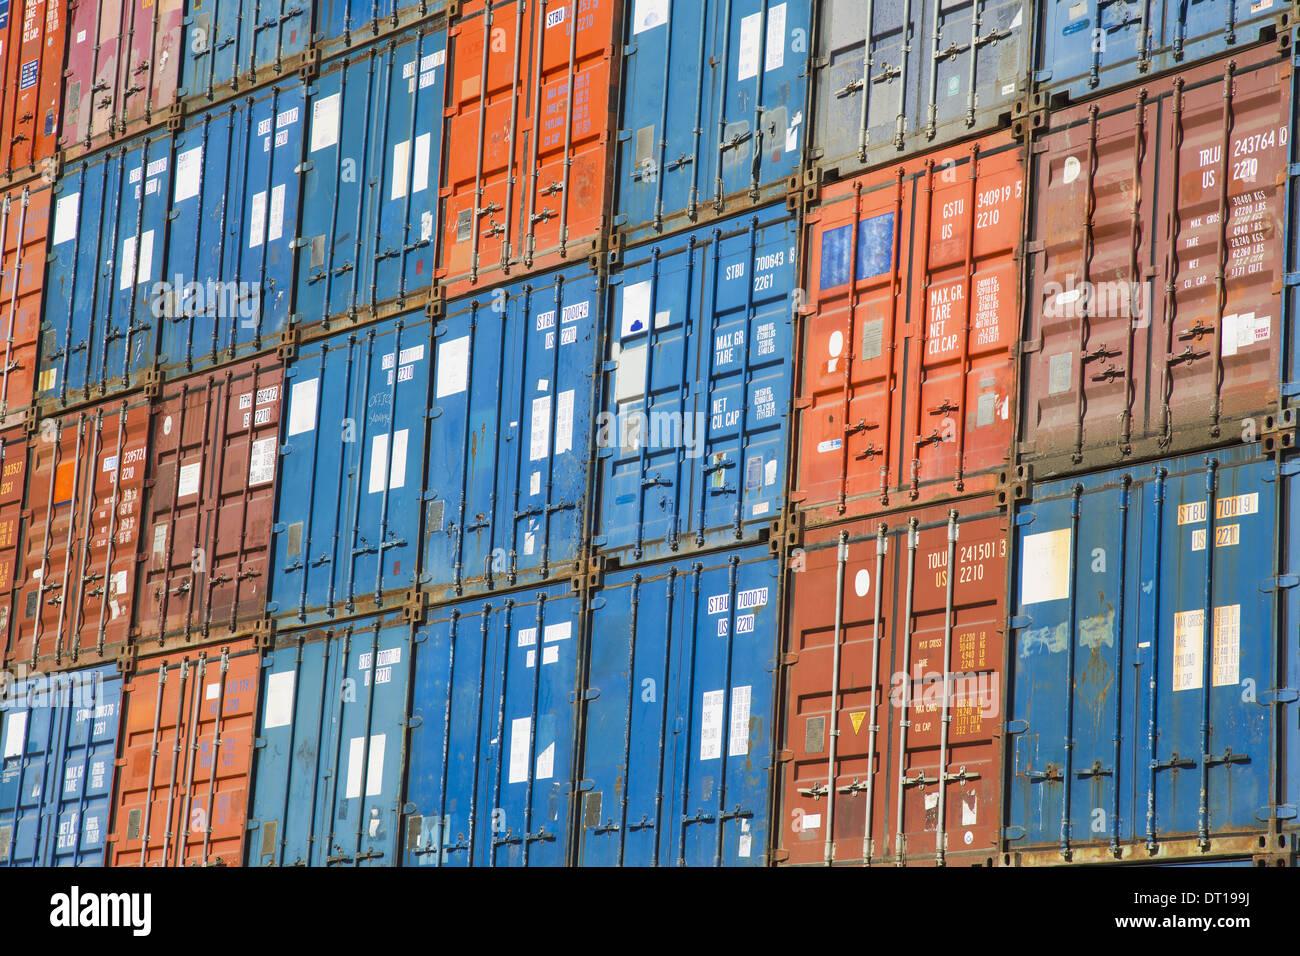 Seattle, Washington, EE.UU. contenedores de carga de contenedores de carga comercial Imagen De Stock